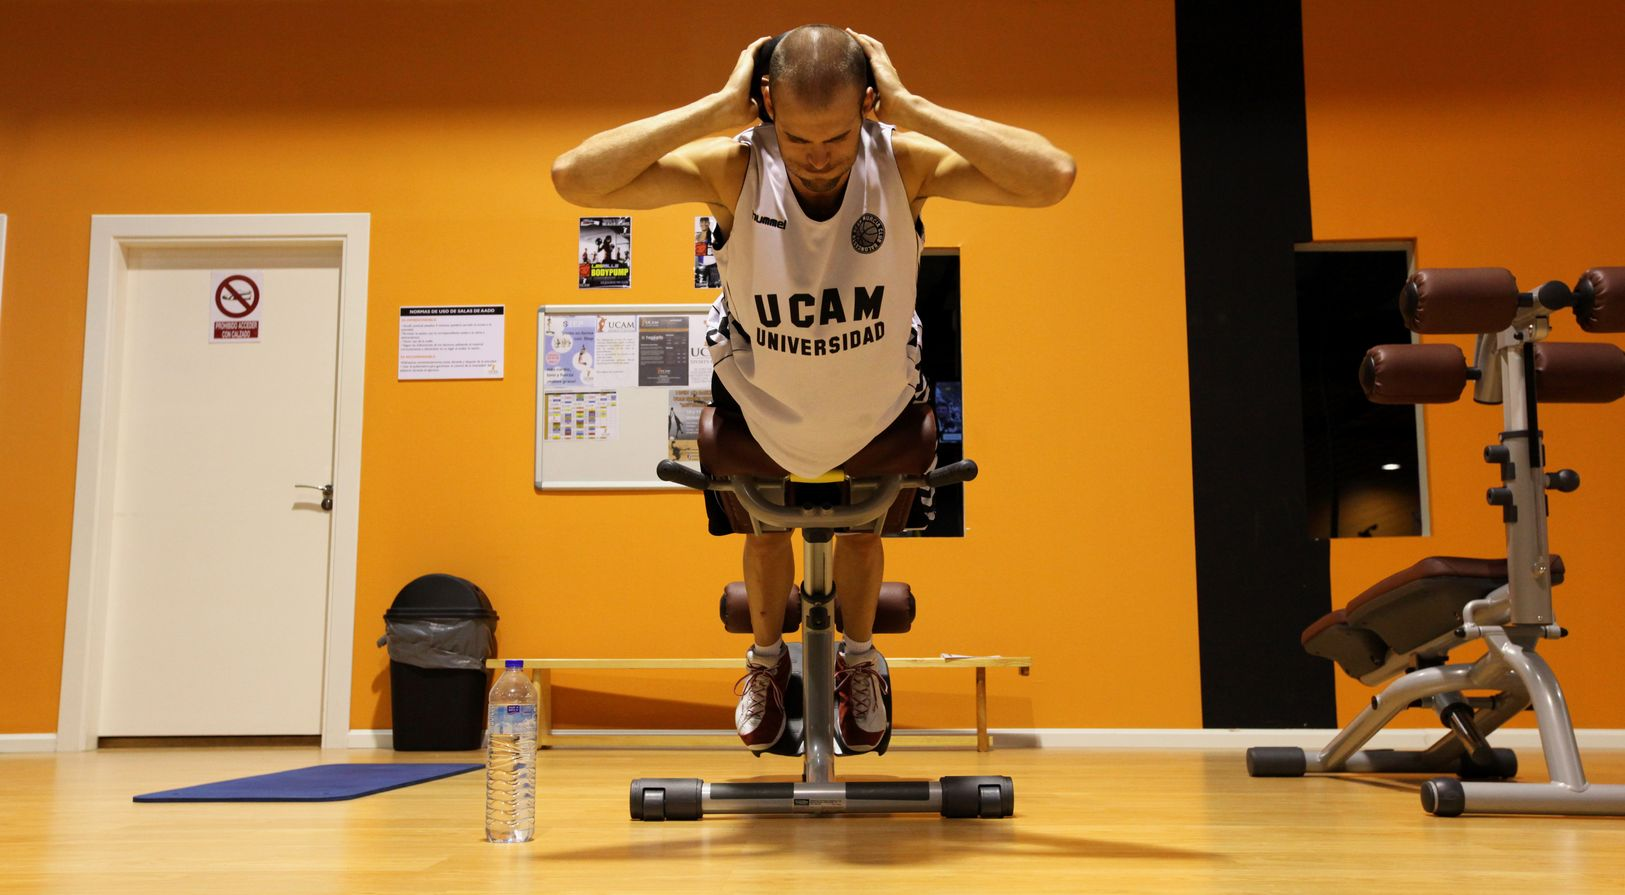 Sport center baloncesto de formación_result.jpg